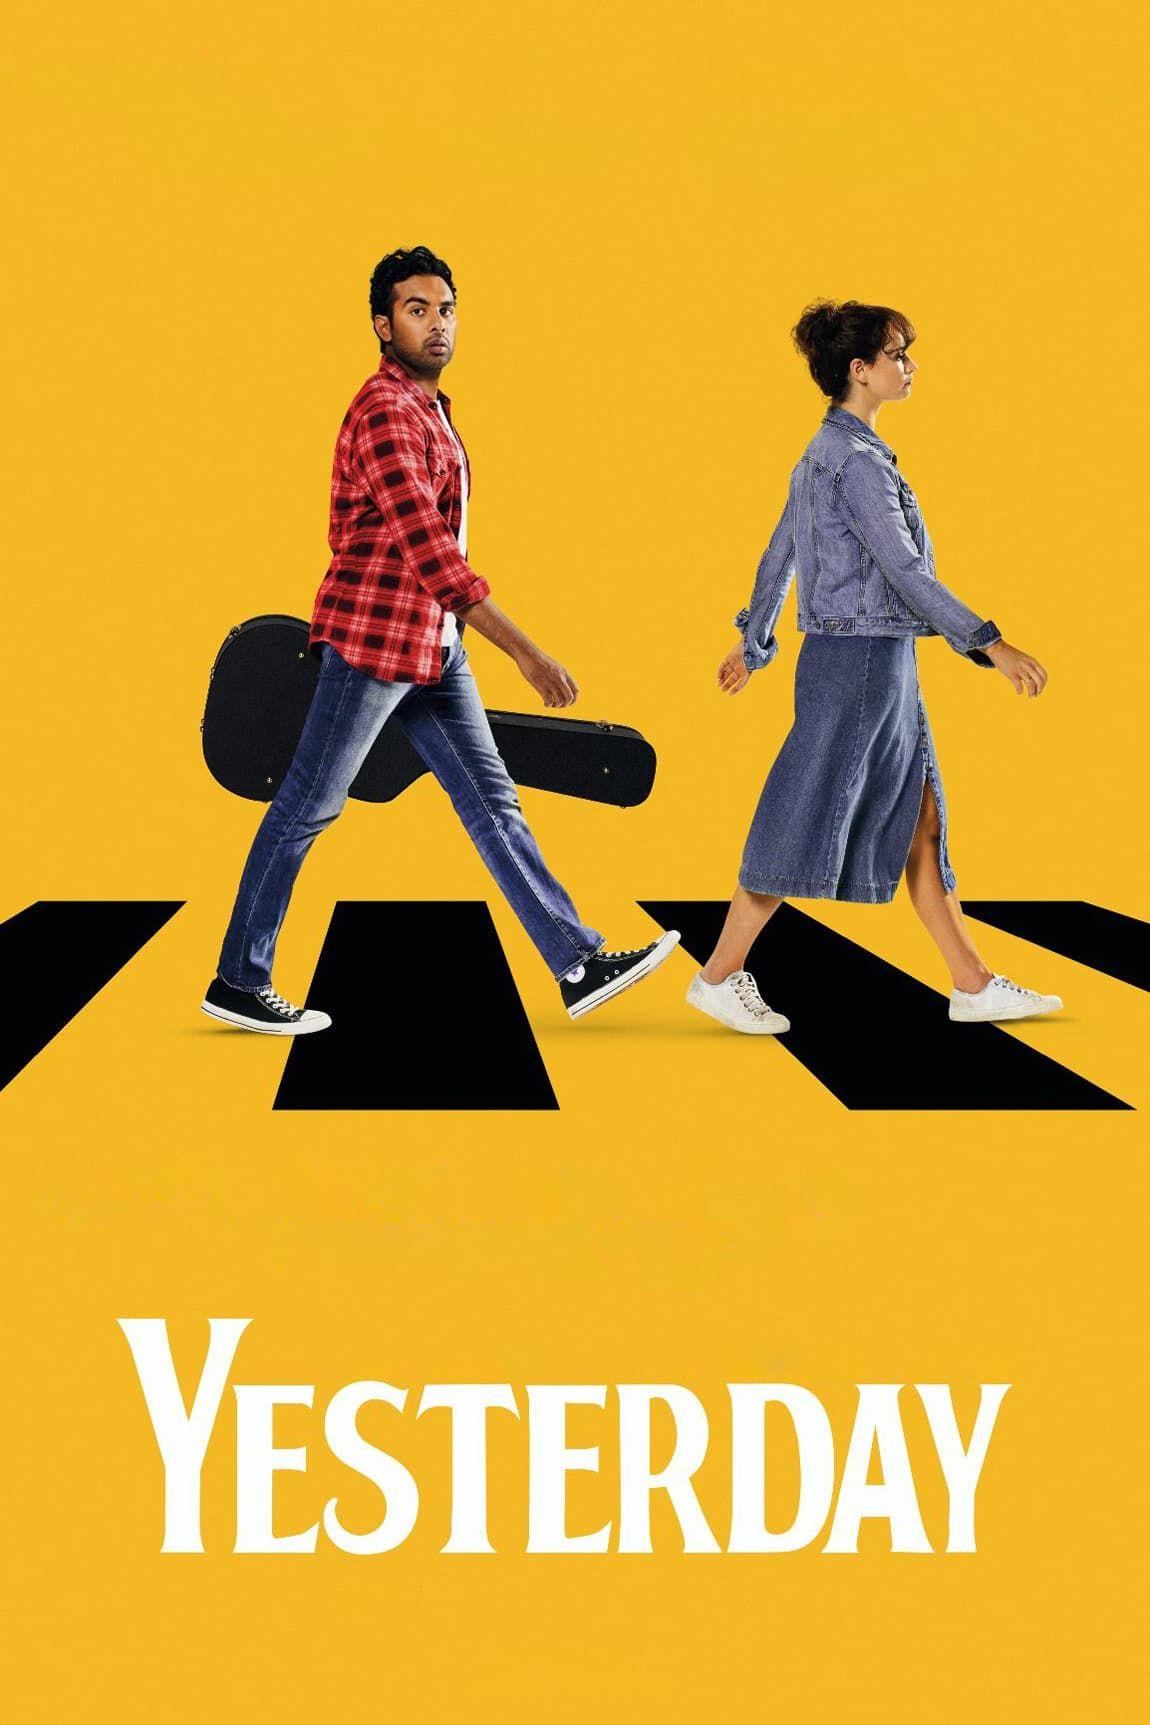 Ver película completa Yesterday [GRATIS] Full movies